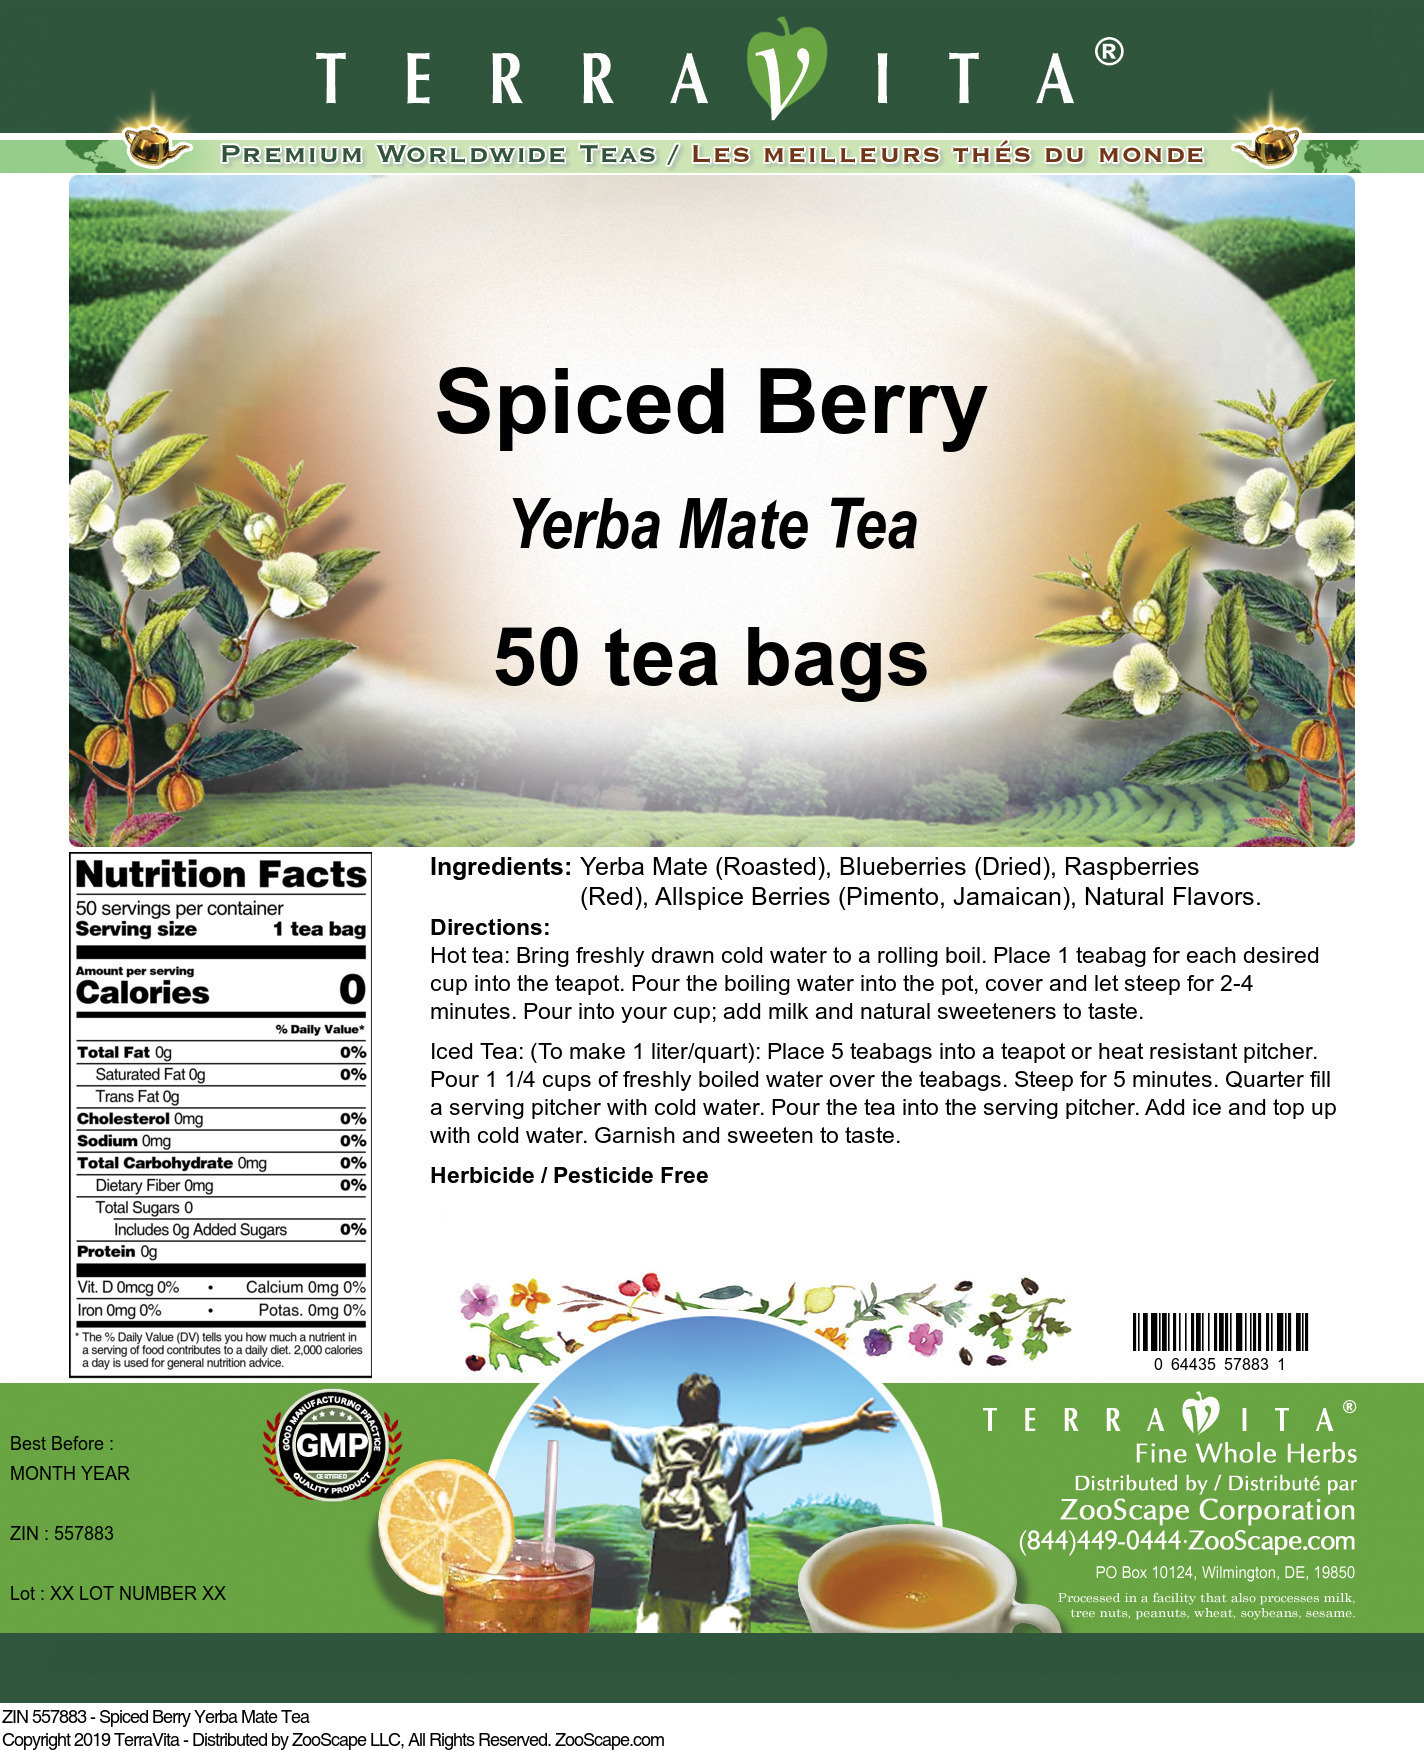 Spiced Berry Yerba Mate